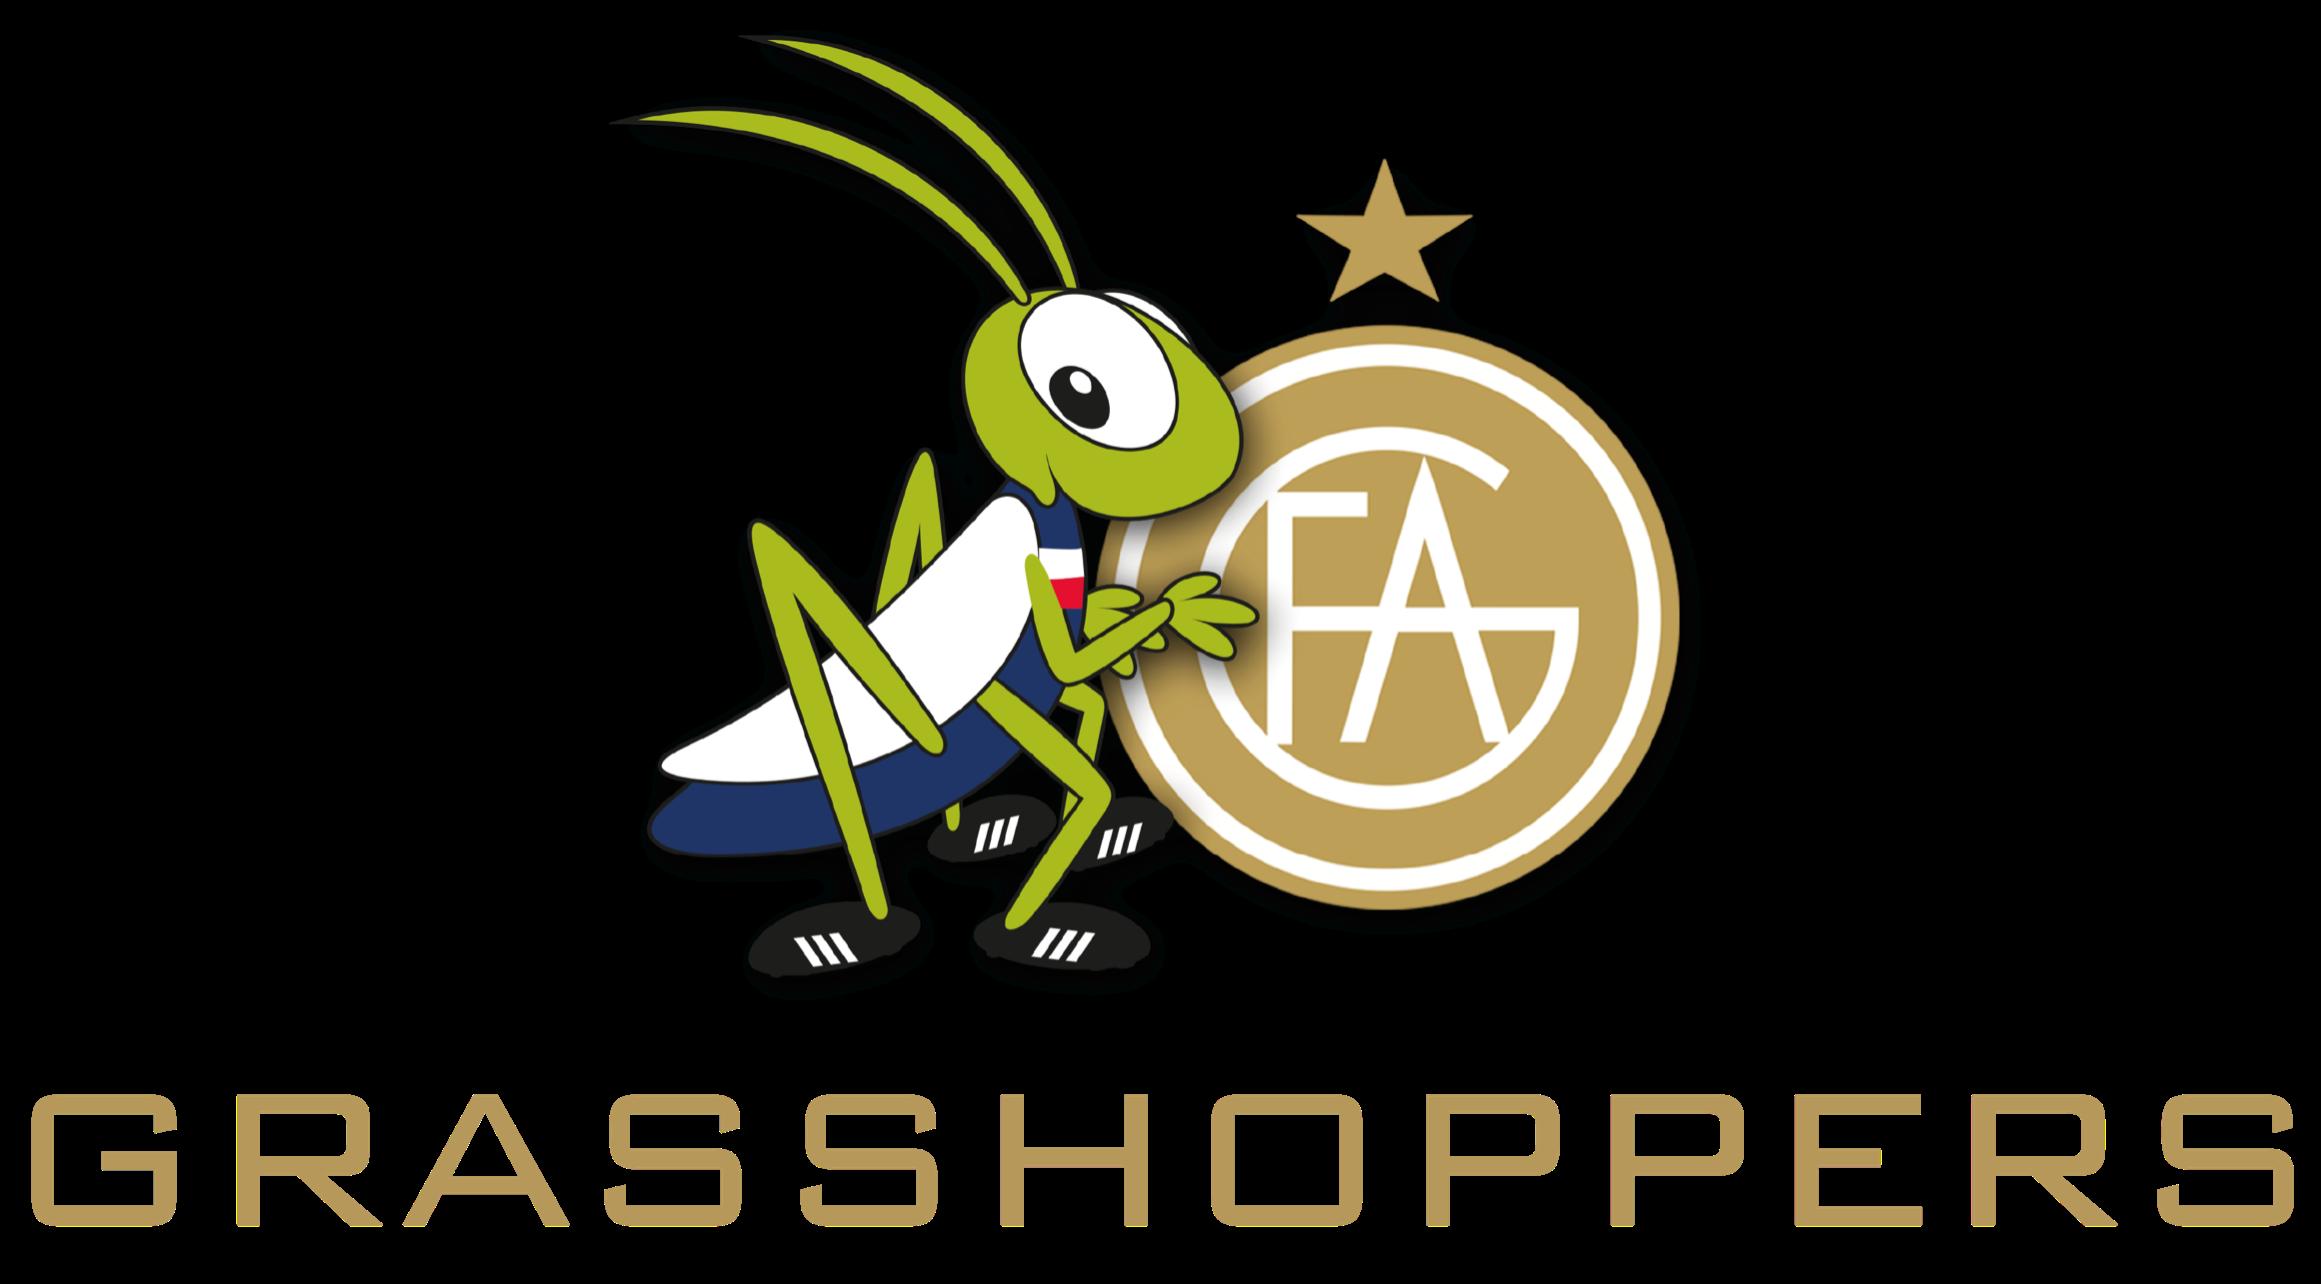 GFA_Grasshoppers_edited